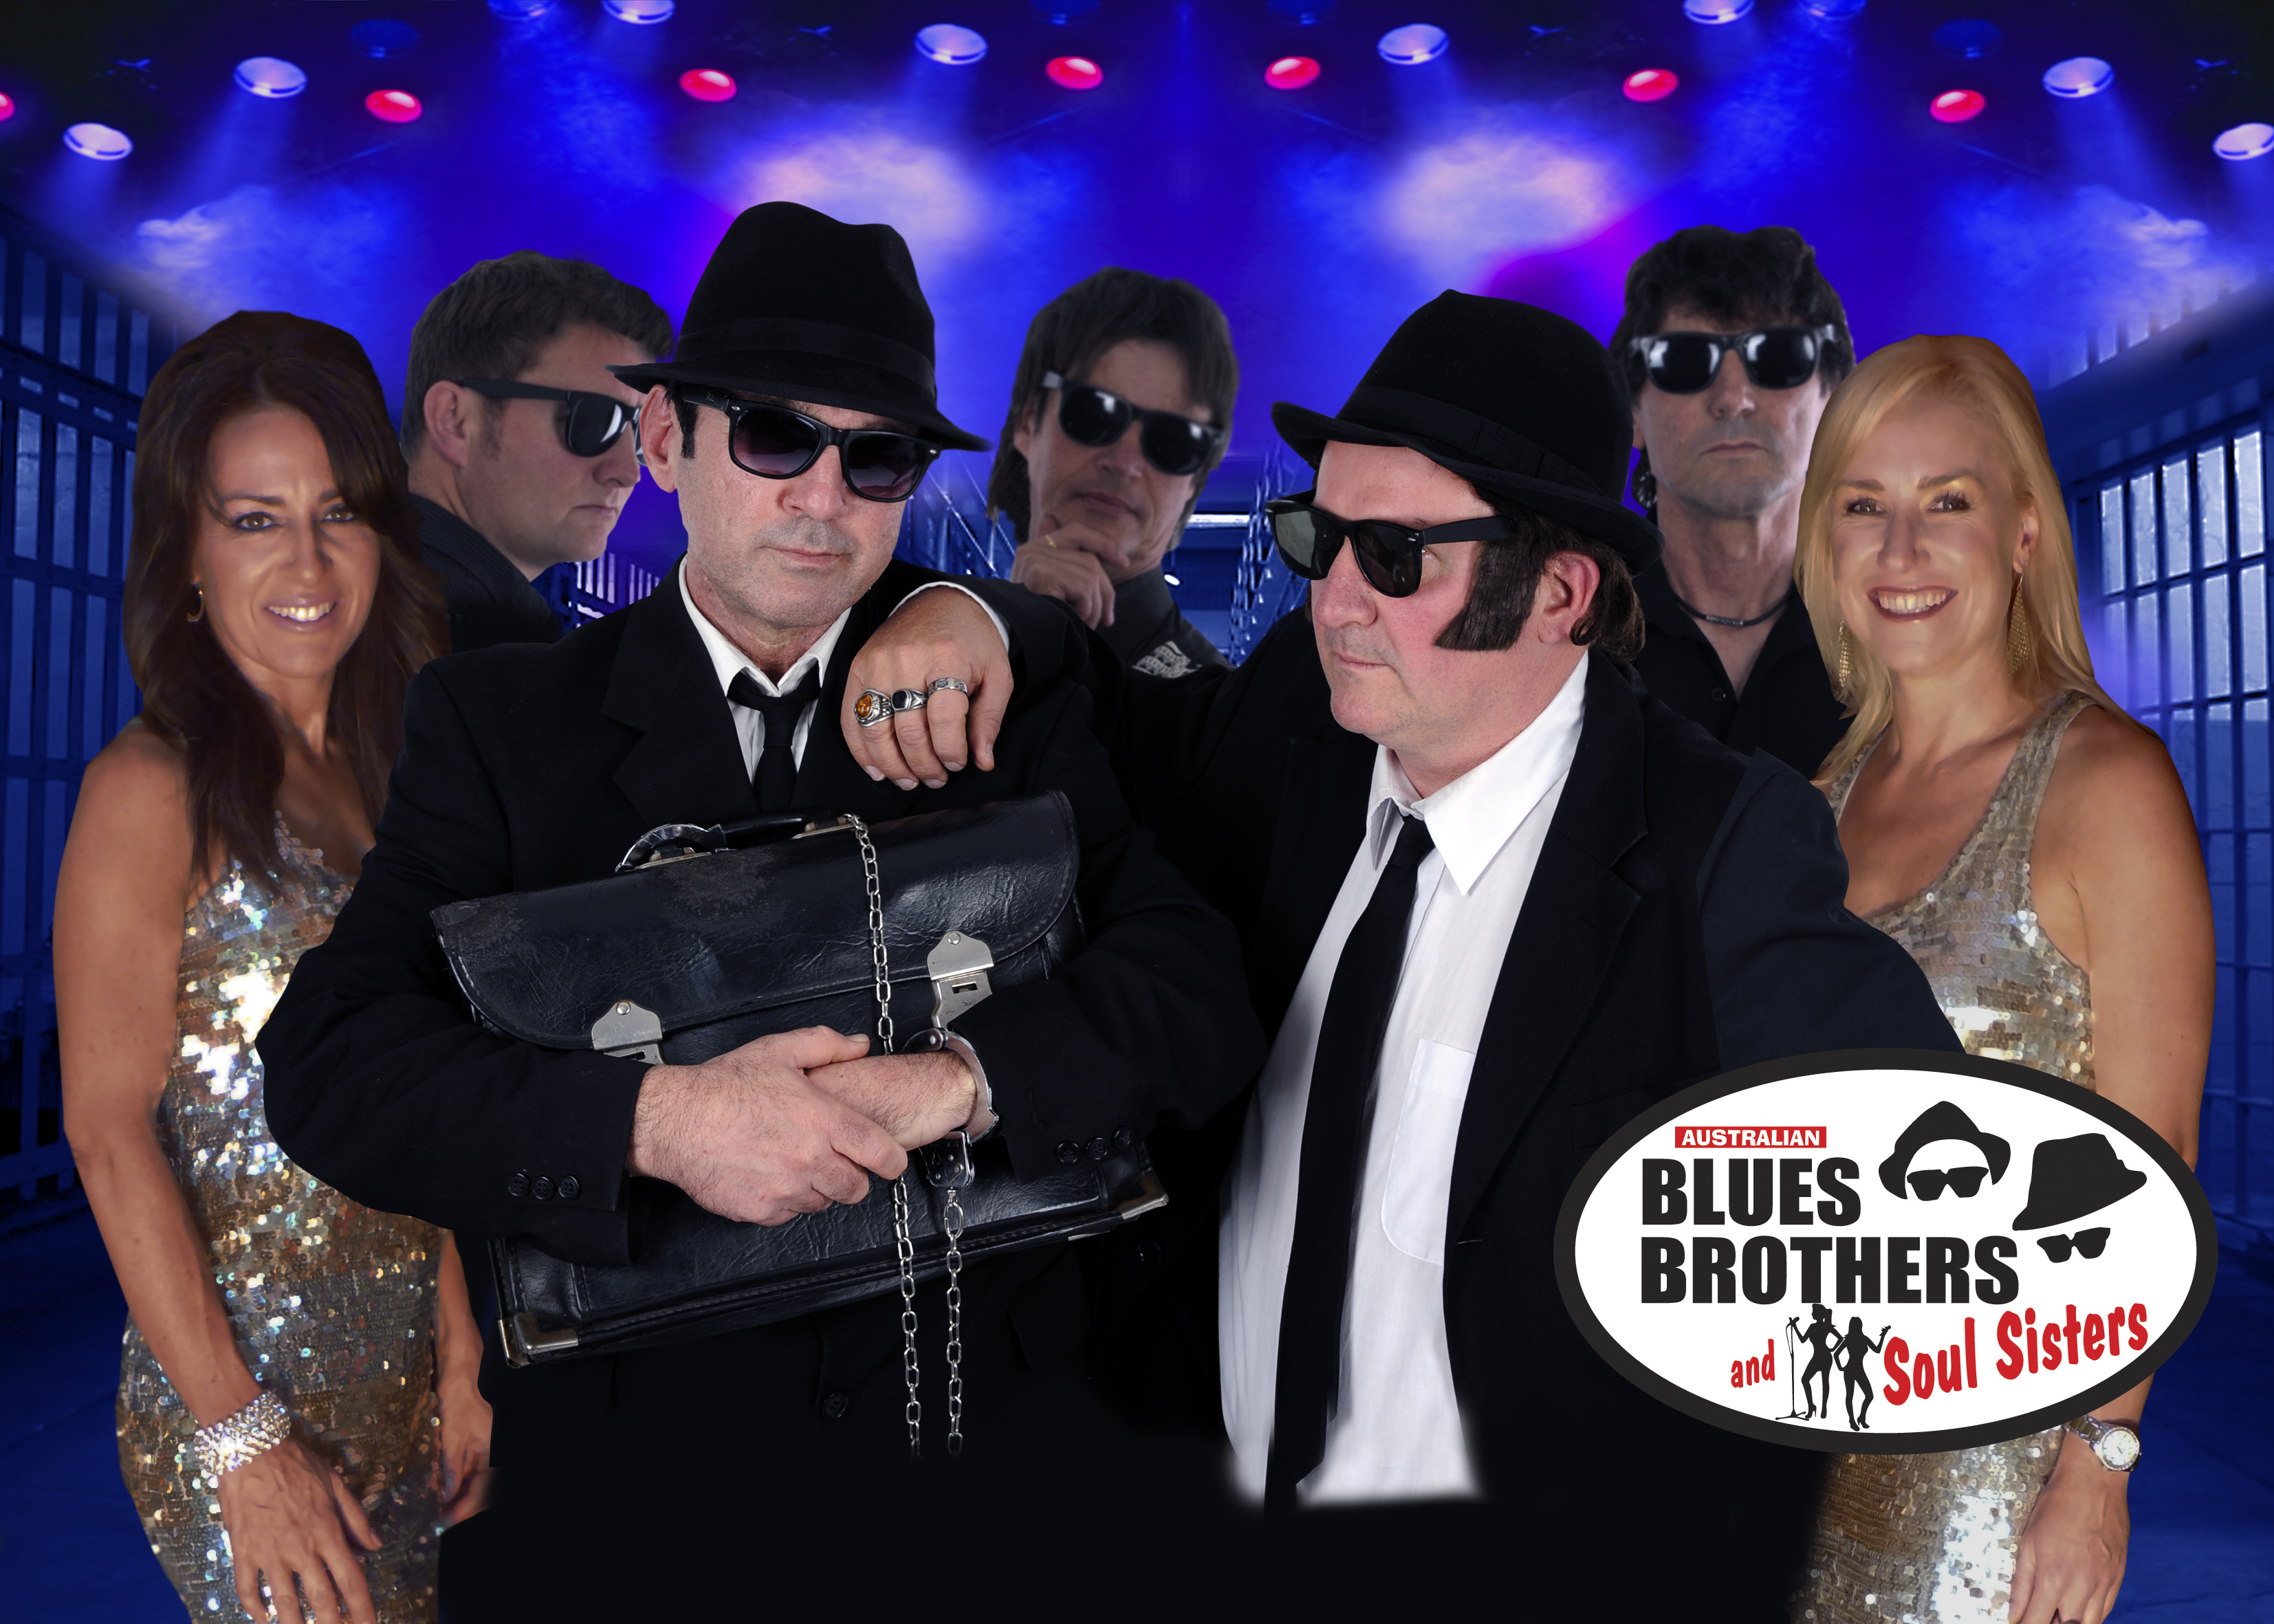 Blues Brothers Tribute Show Band Perth Australia